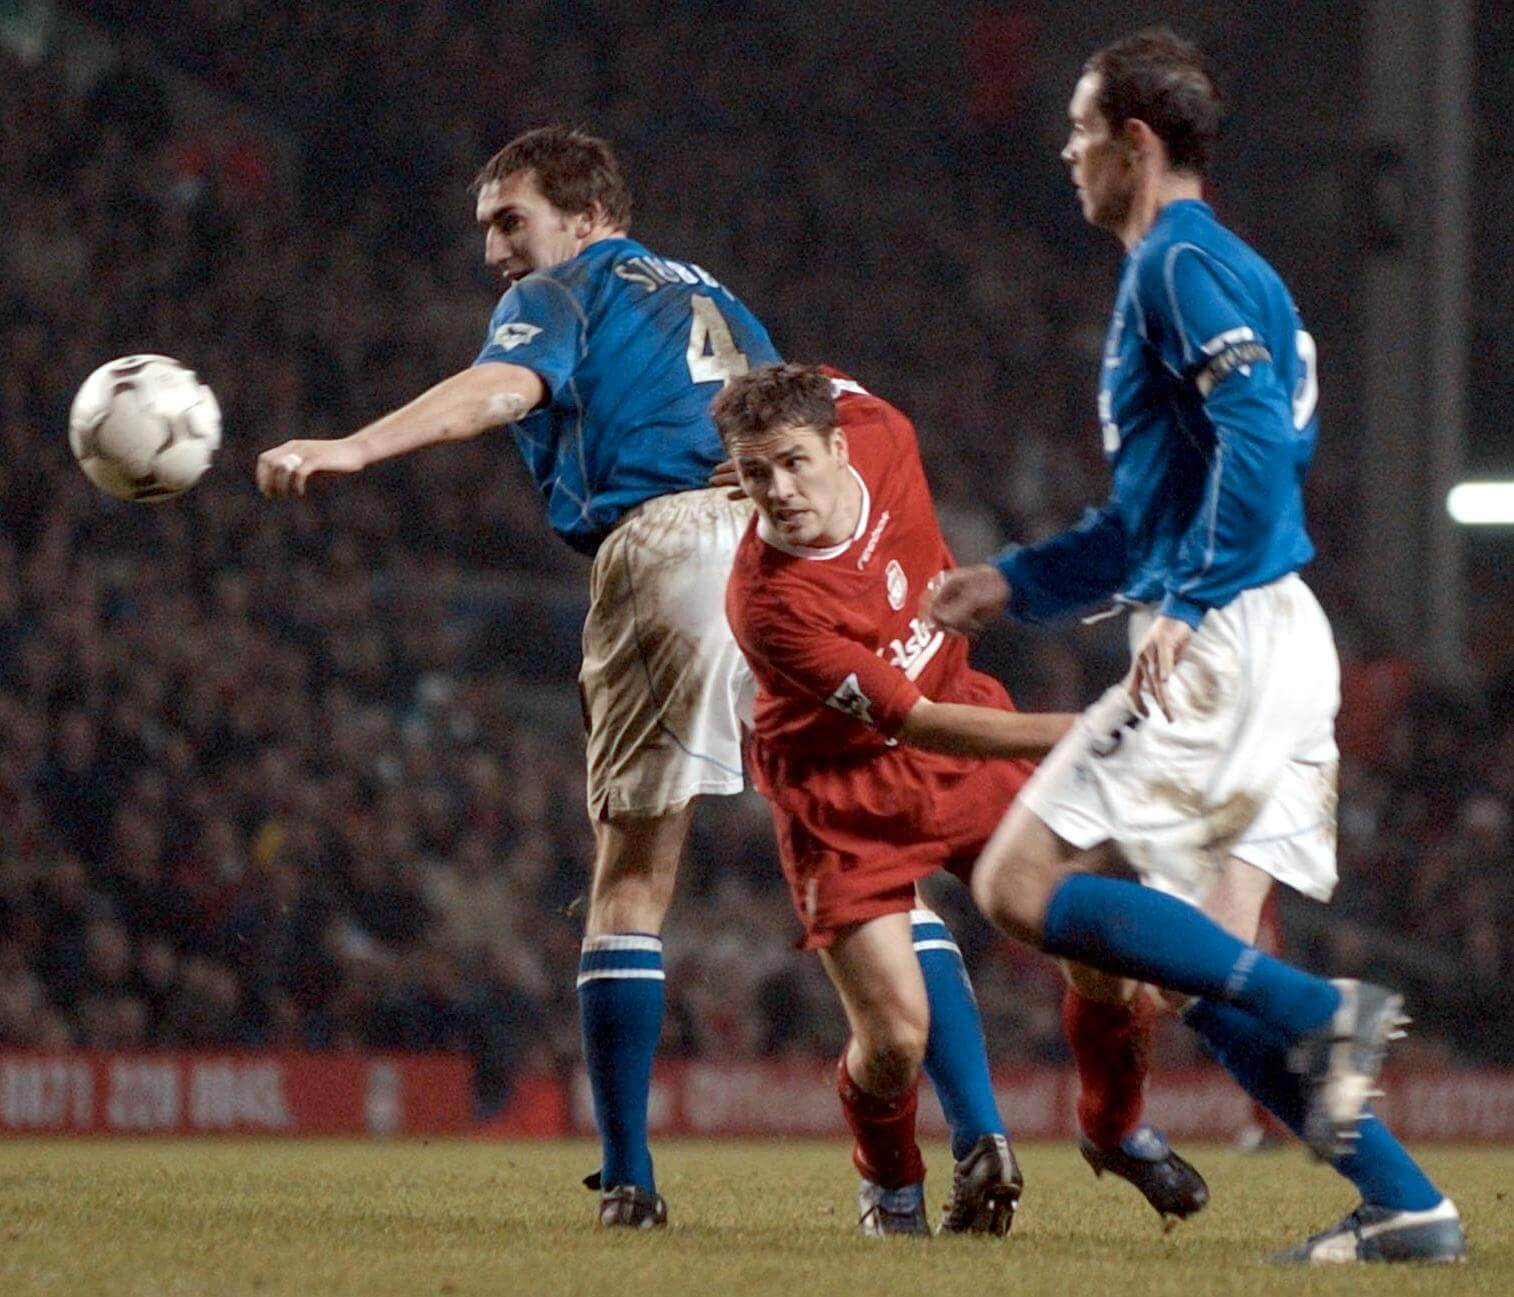 Liverpool - Everton | The Merseyside derby